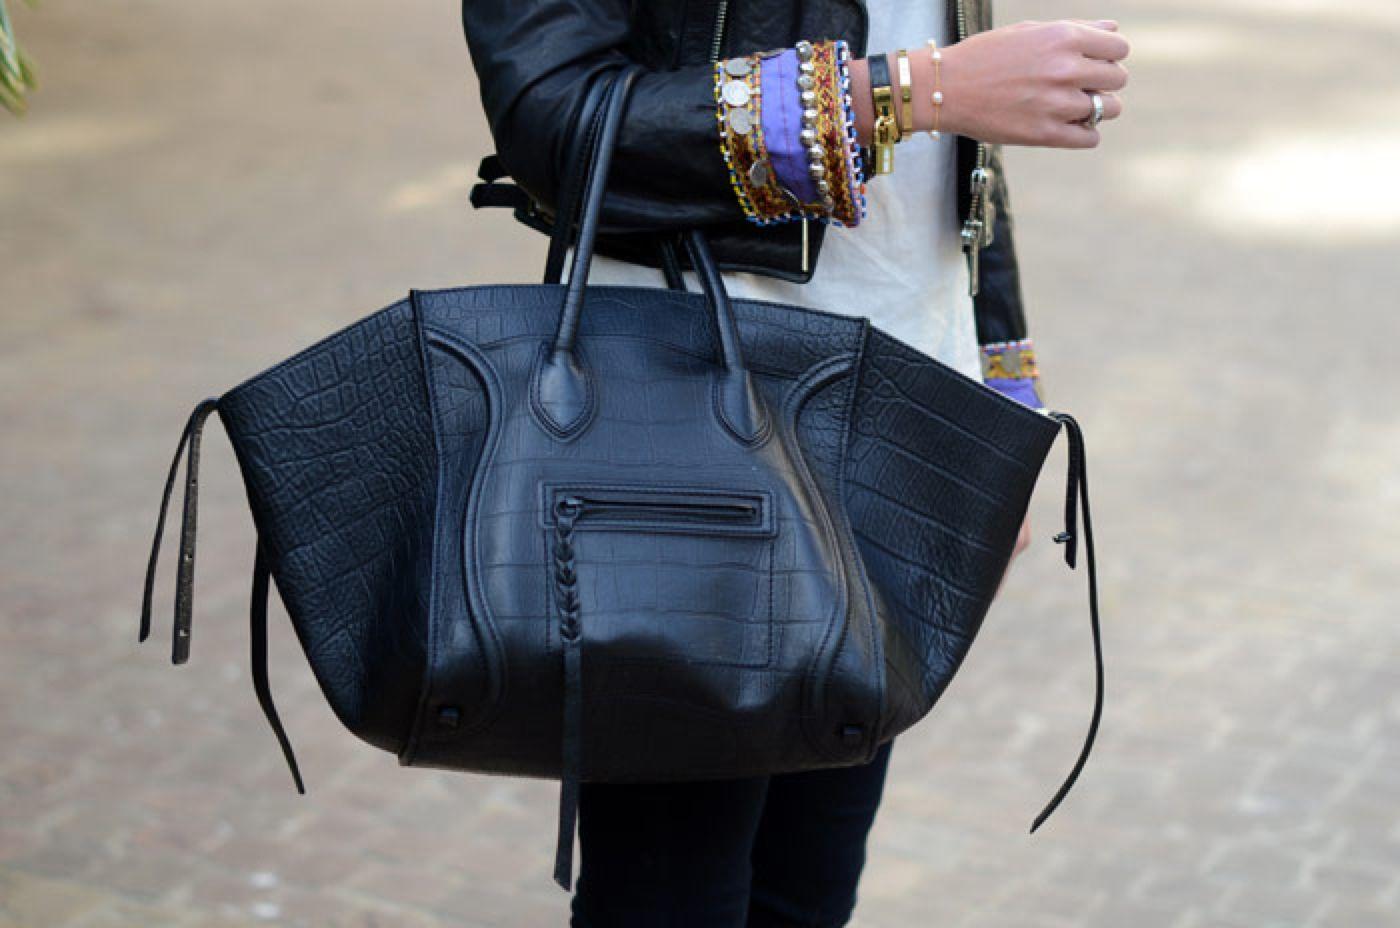 9960757f83 Celine phantom croc - I would love to own this handbag ...